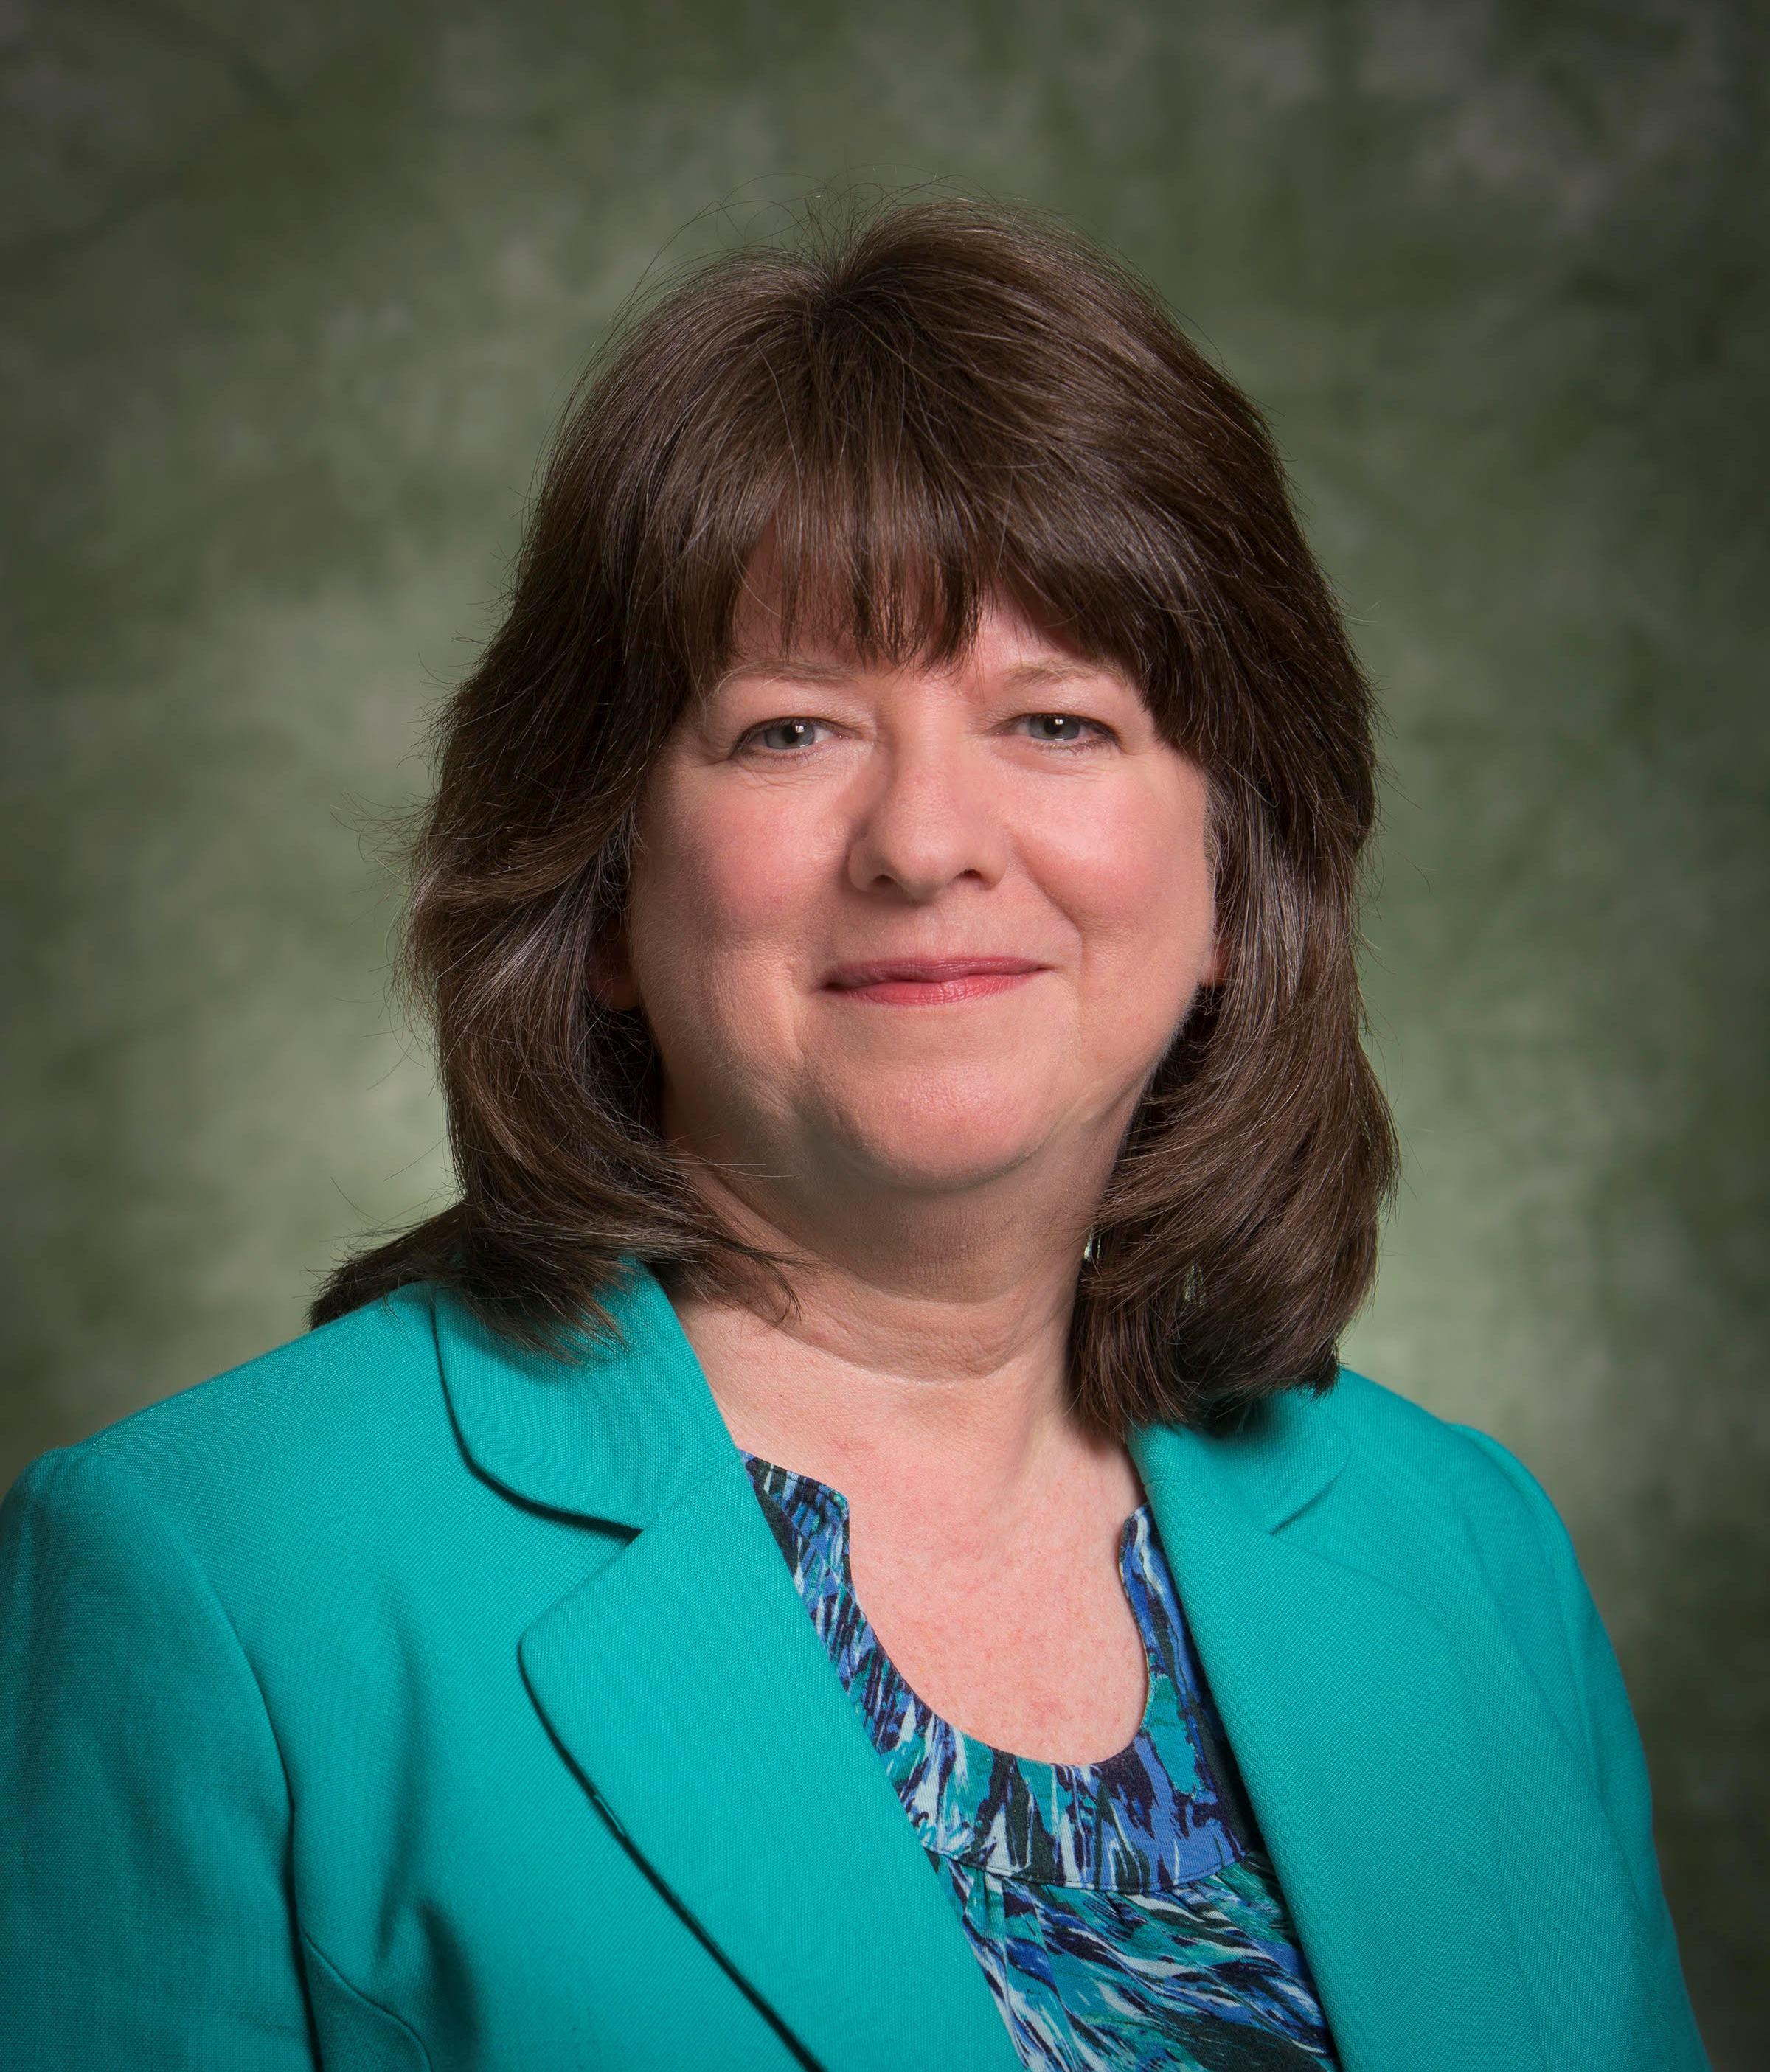 Jill Dixon, 2015 Chancellor's Award Winner for Excellence in Faculty Service